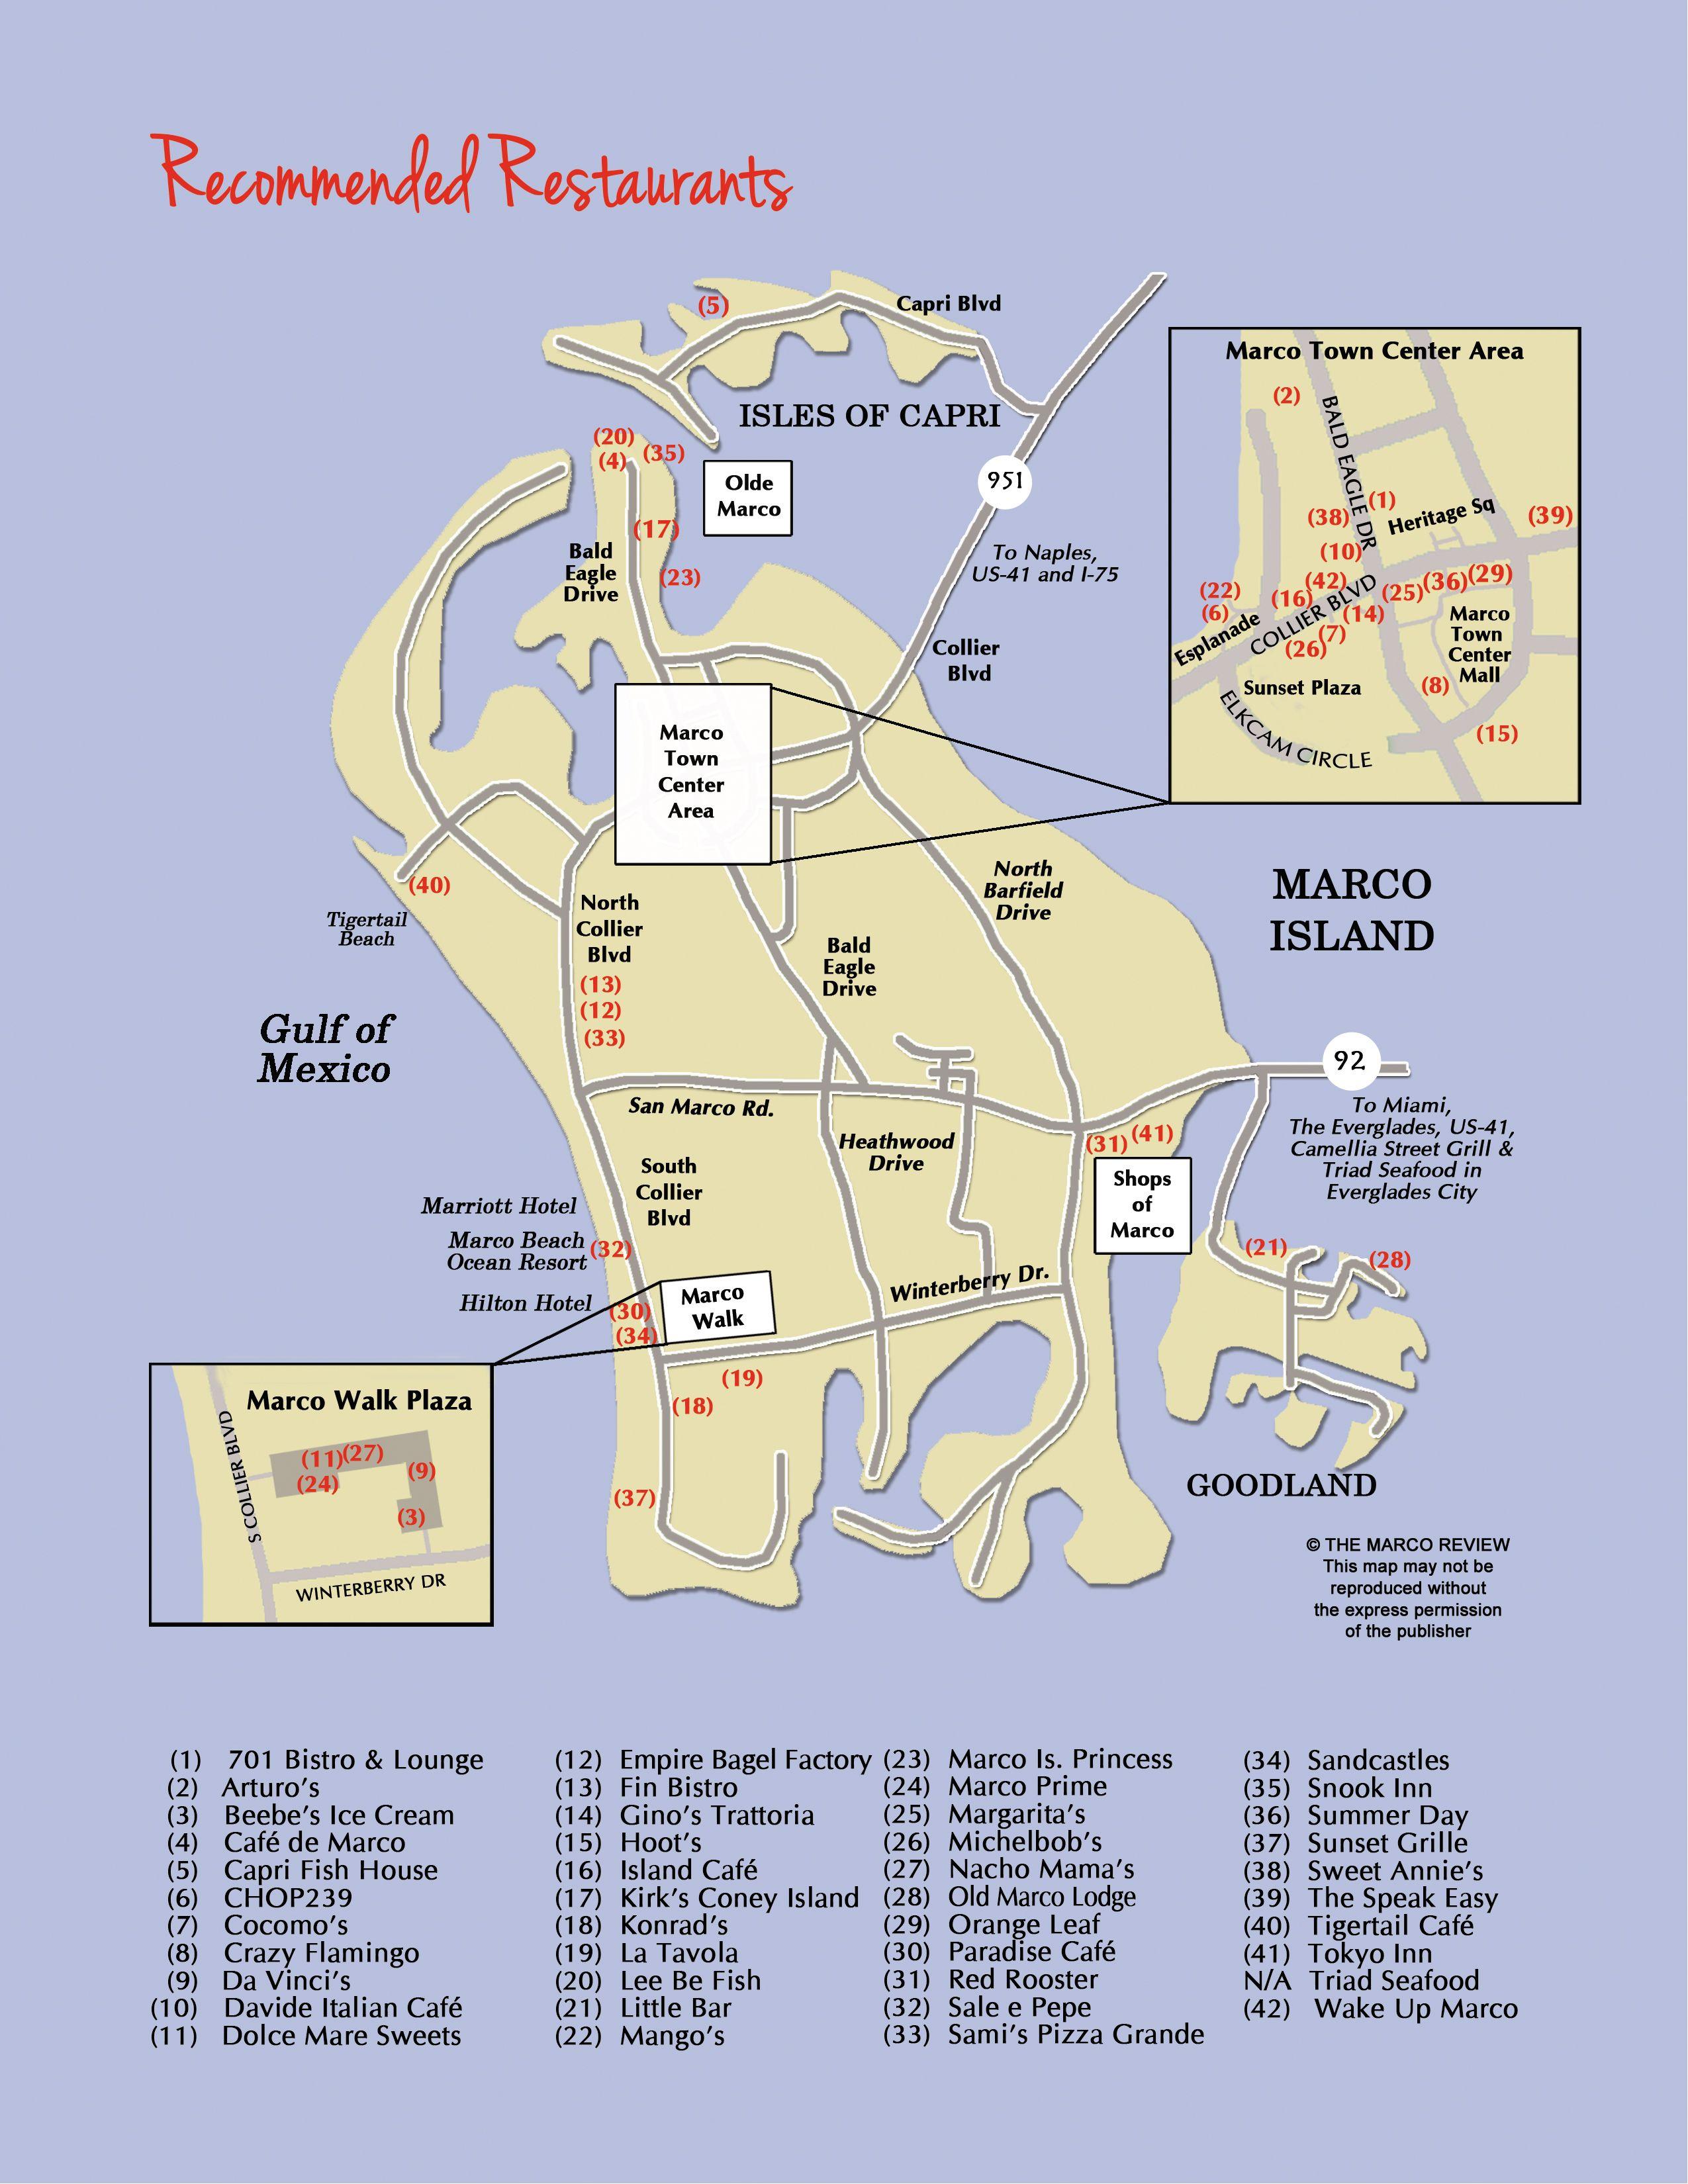 Restaurant Map Of Marco Island, Florida Restaurants. | Oh, The - Marco Island Florida Map